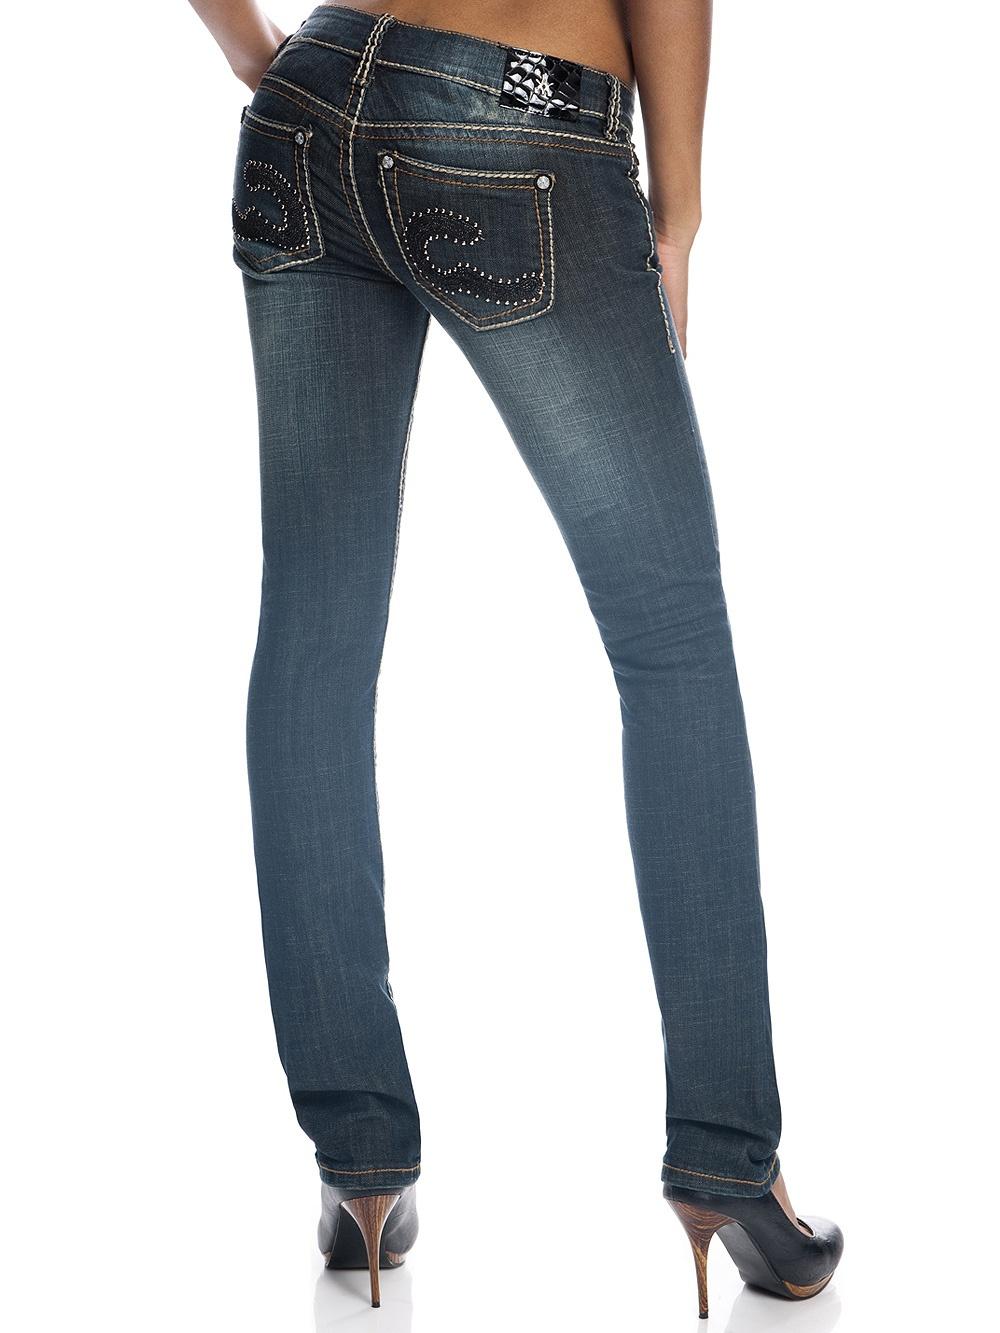 Rivet Damen Studded Charlotte 4816 Jeans Antique W2EeDHYI9